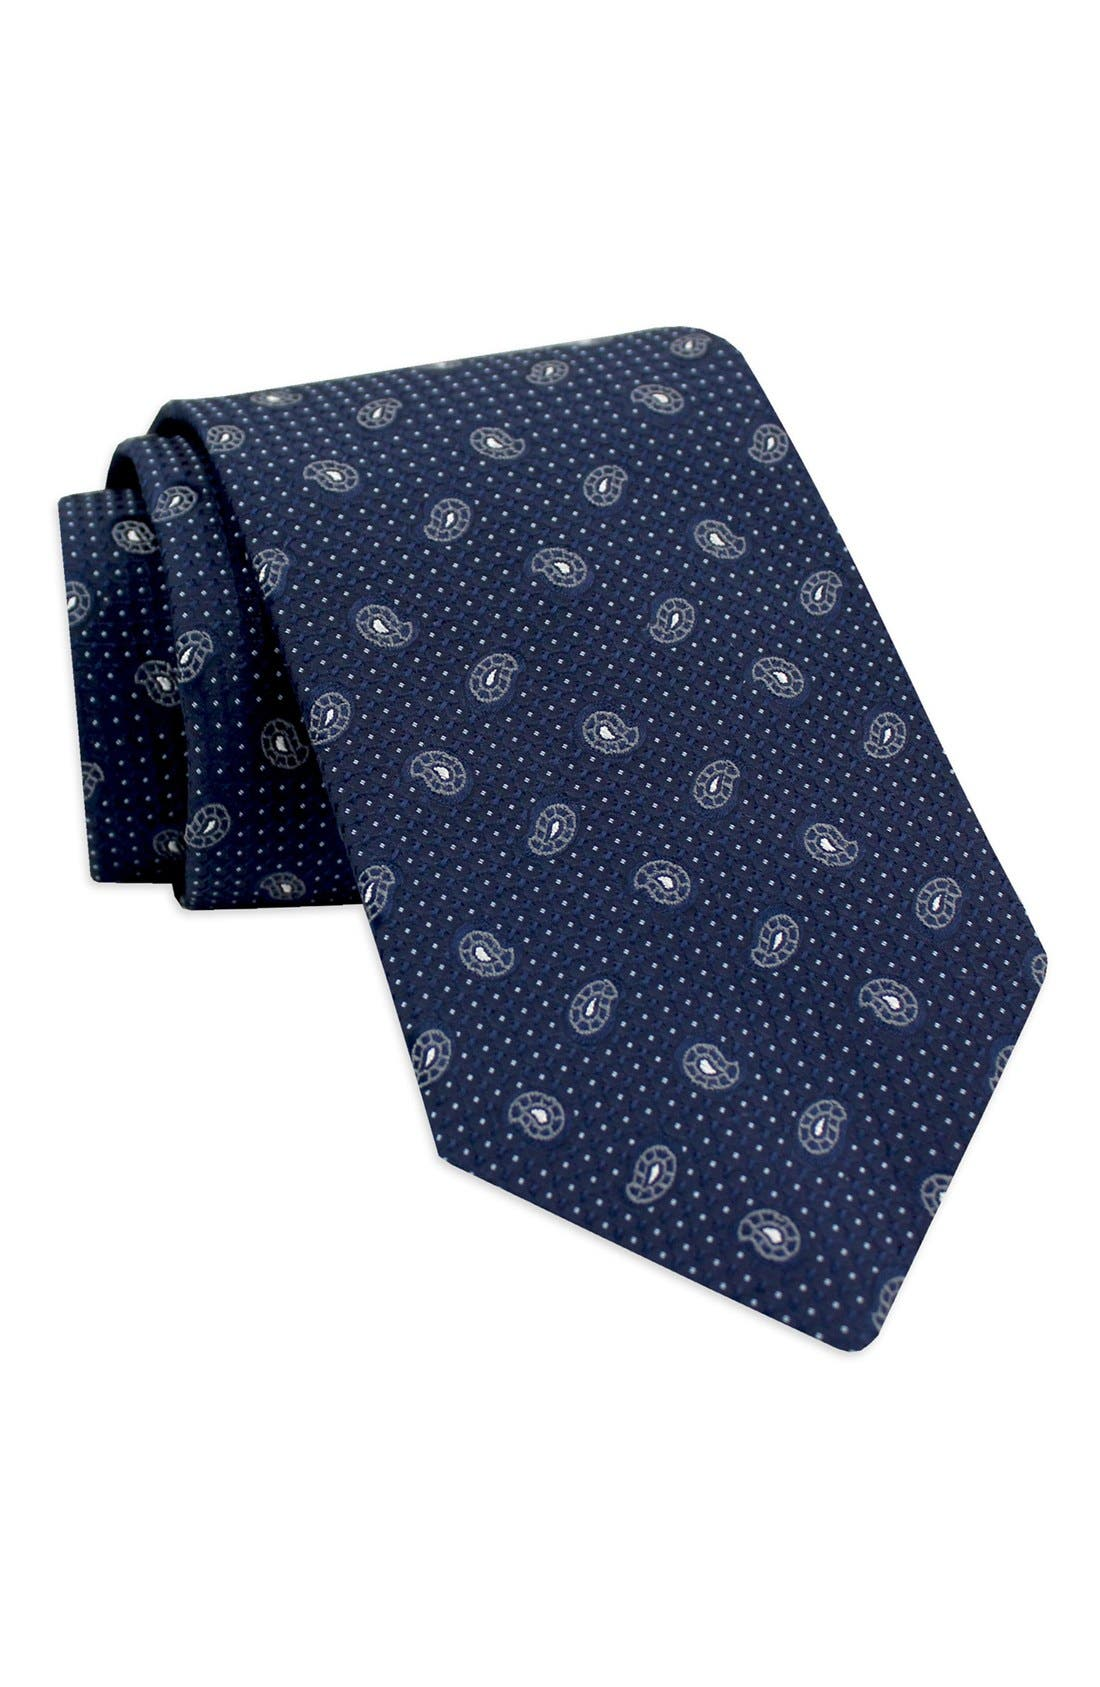 Main Image - Gitman Paisley Woven Silk Tie